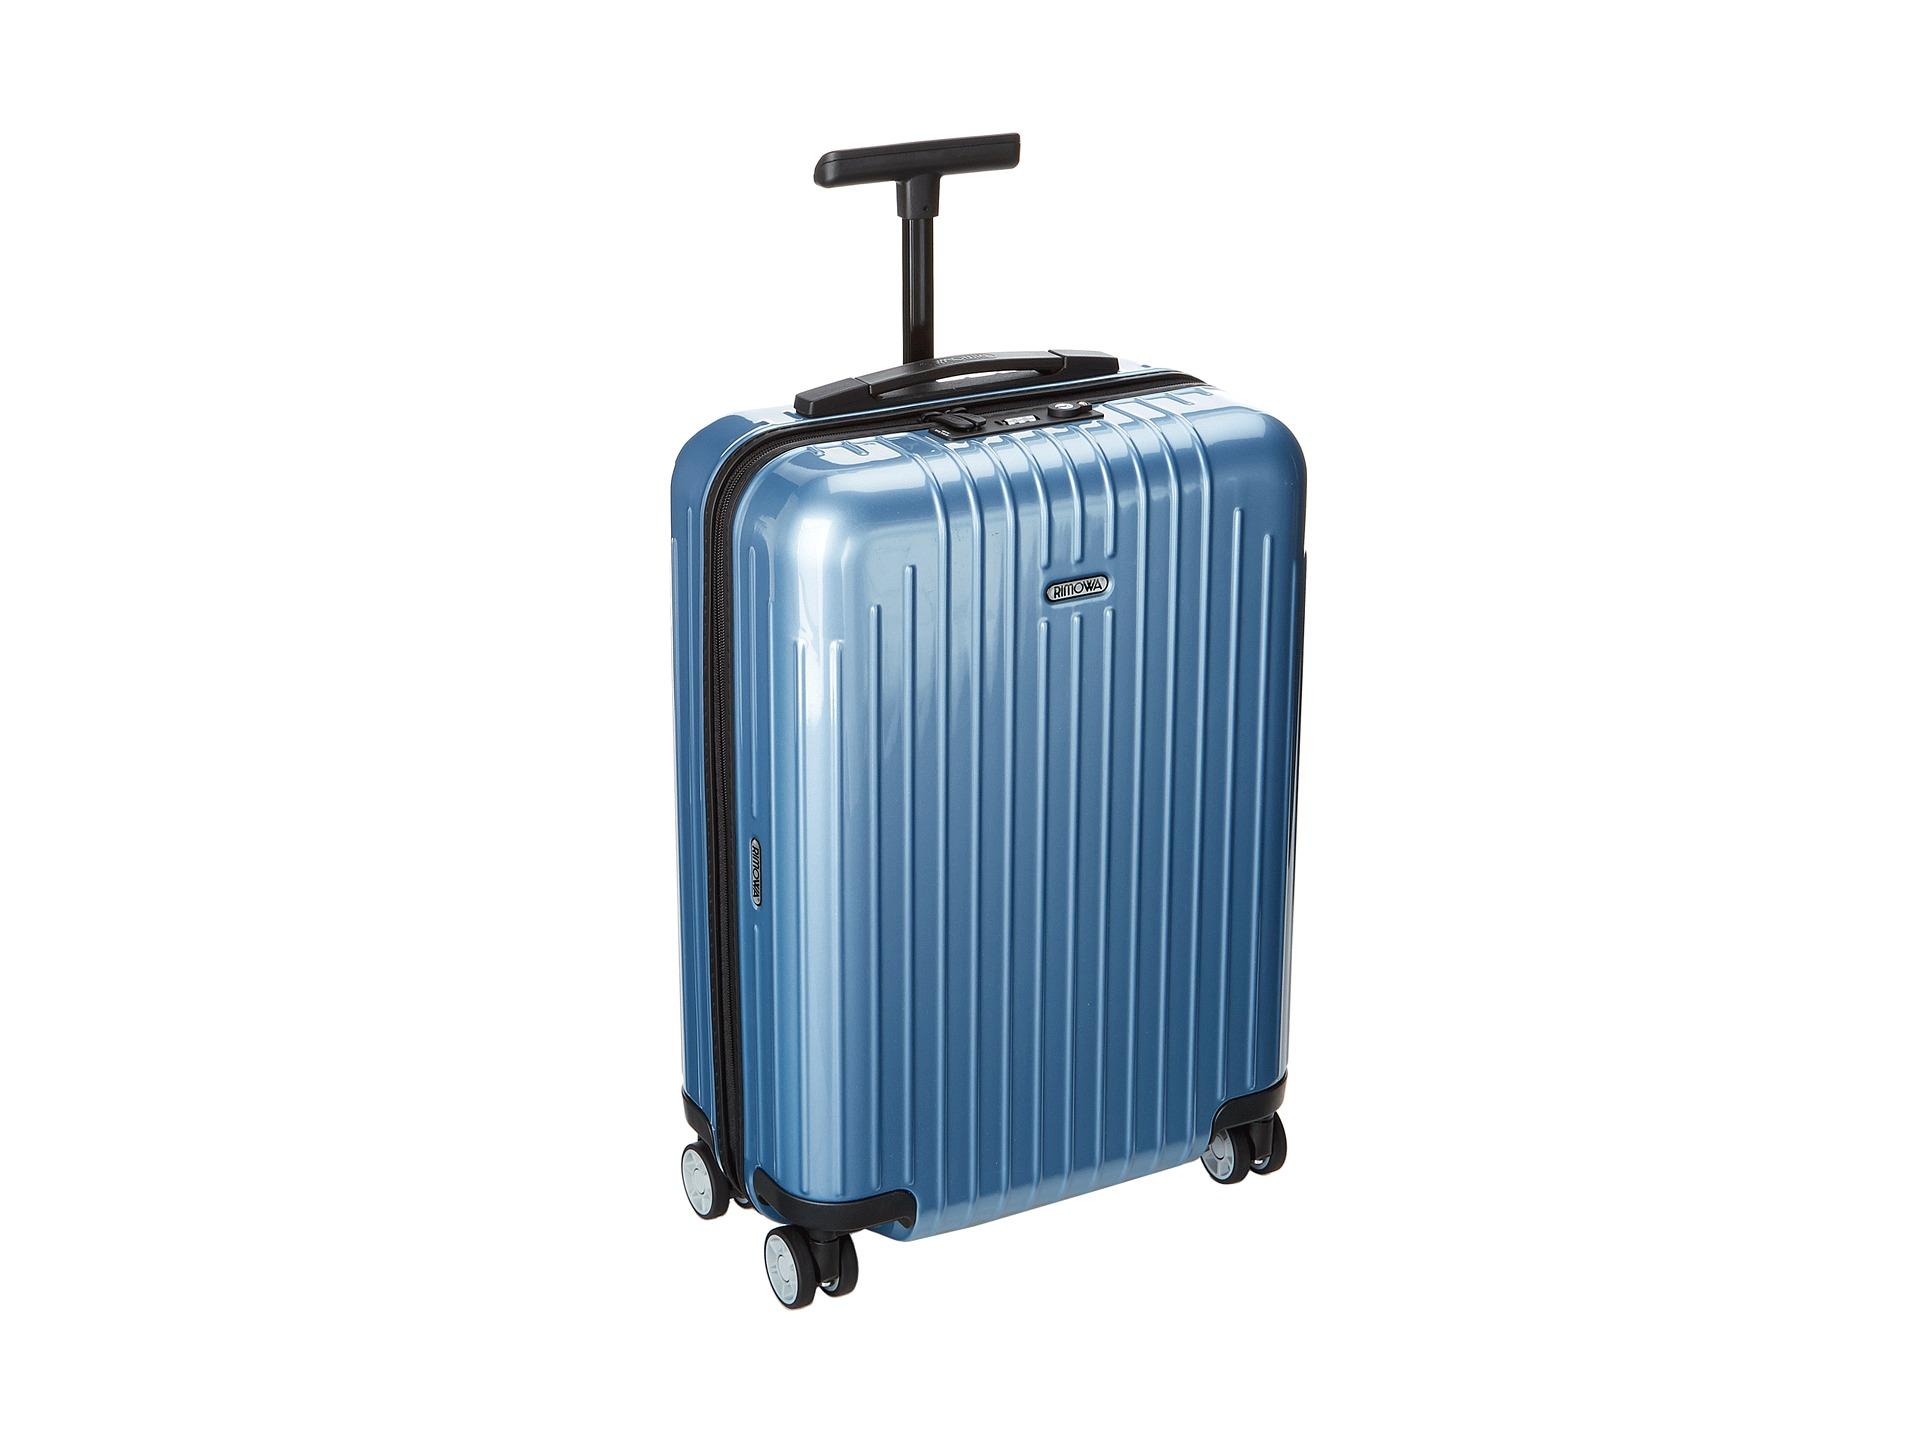 rimowa salsa air ultralight cabin multiwheel ice blue free shipping both ways. Black Bedroom Furniture Sets. Home Design Ideas